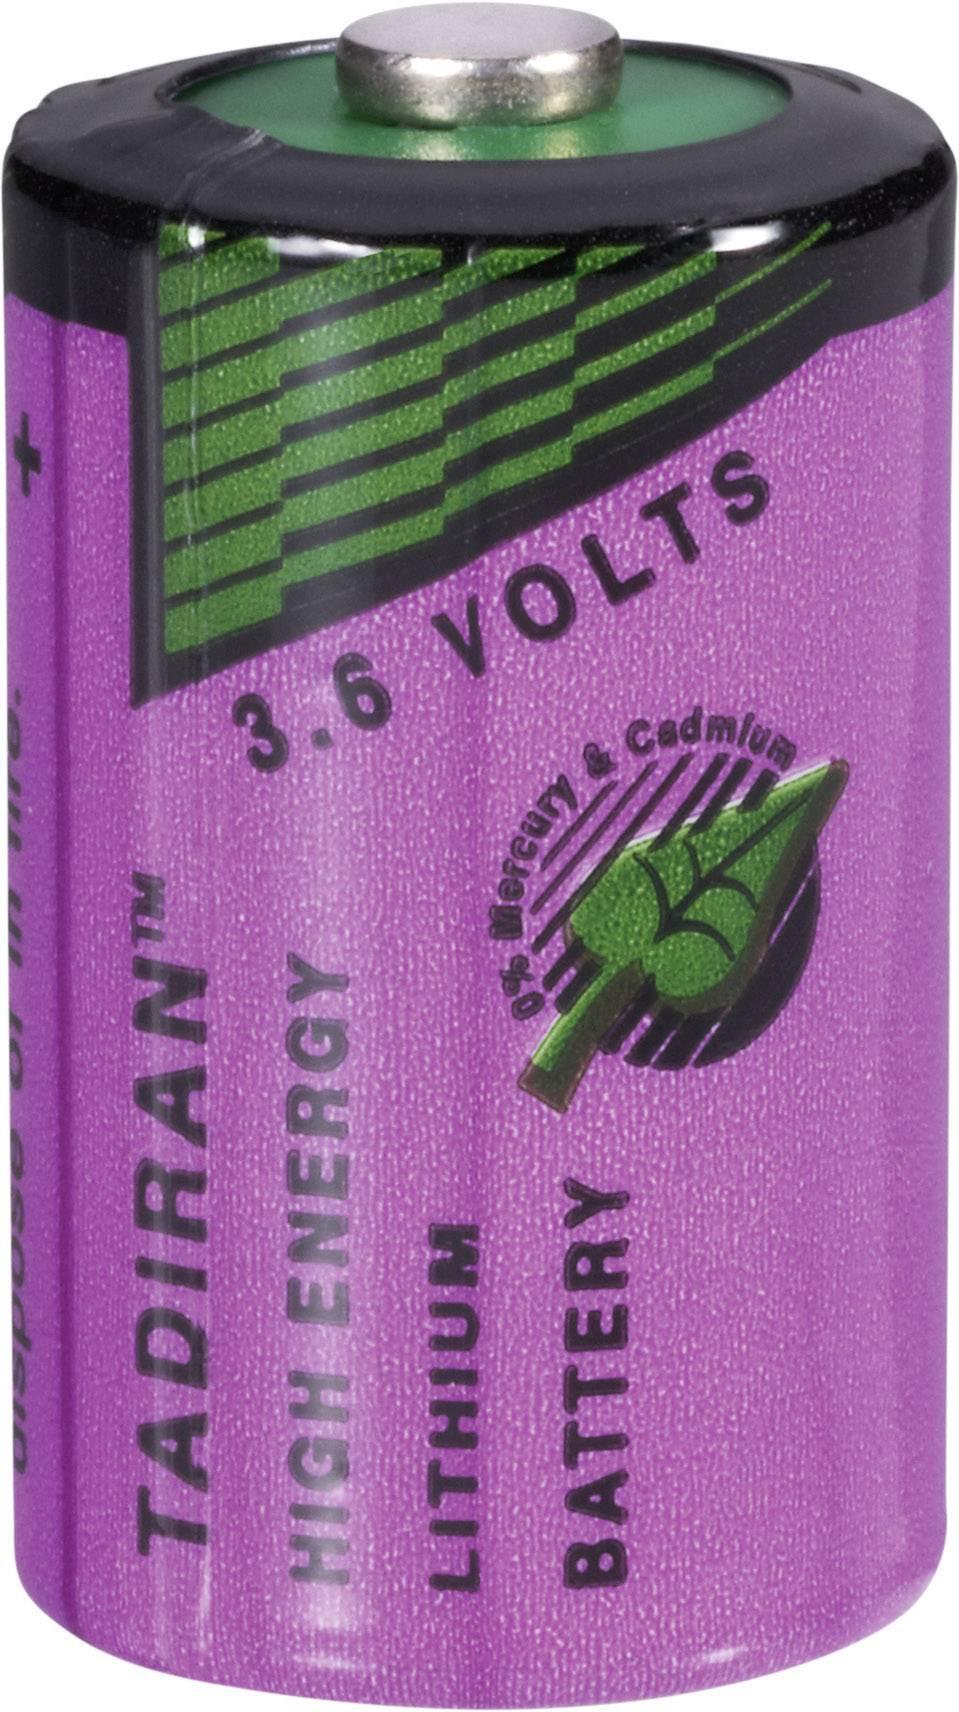 Lithiová baterie Tadiran SL-750/S, typ 1/2 AA